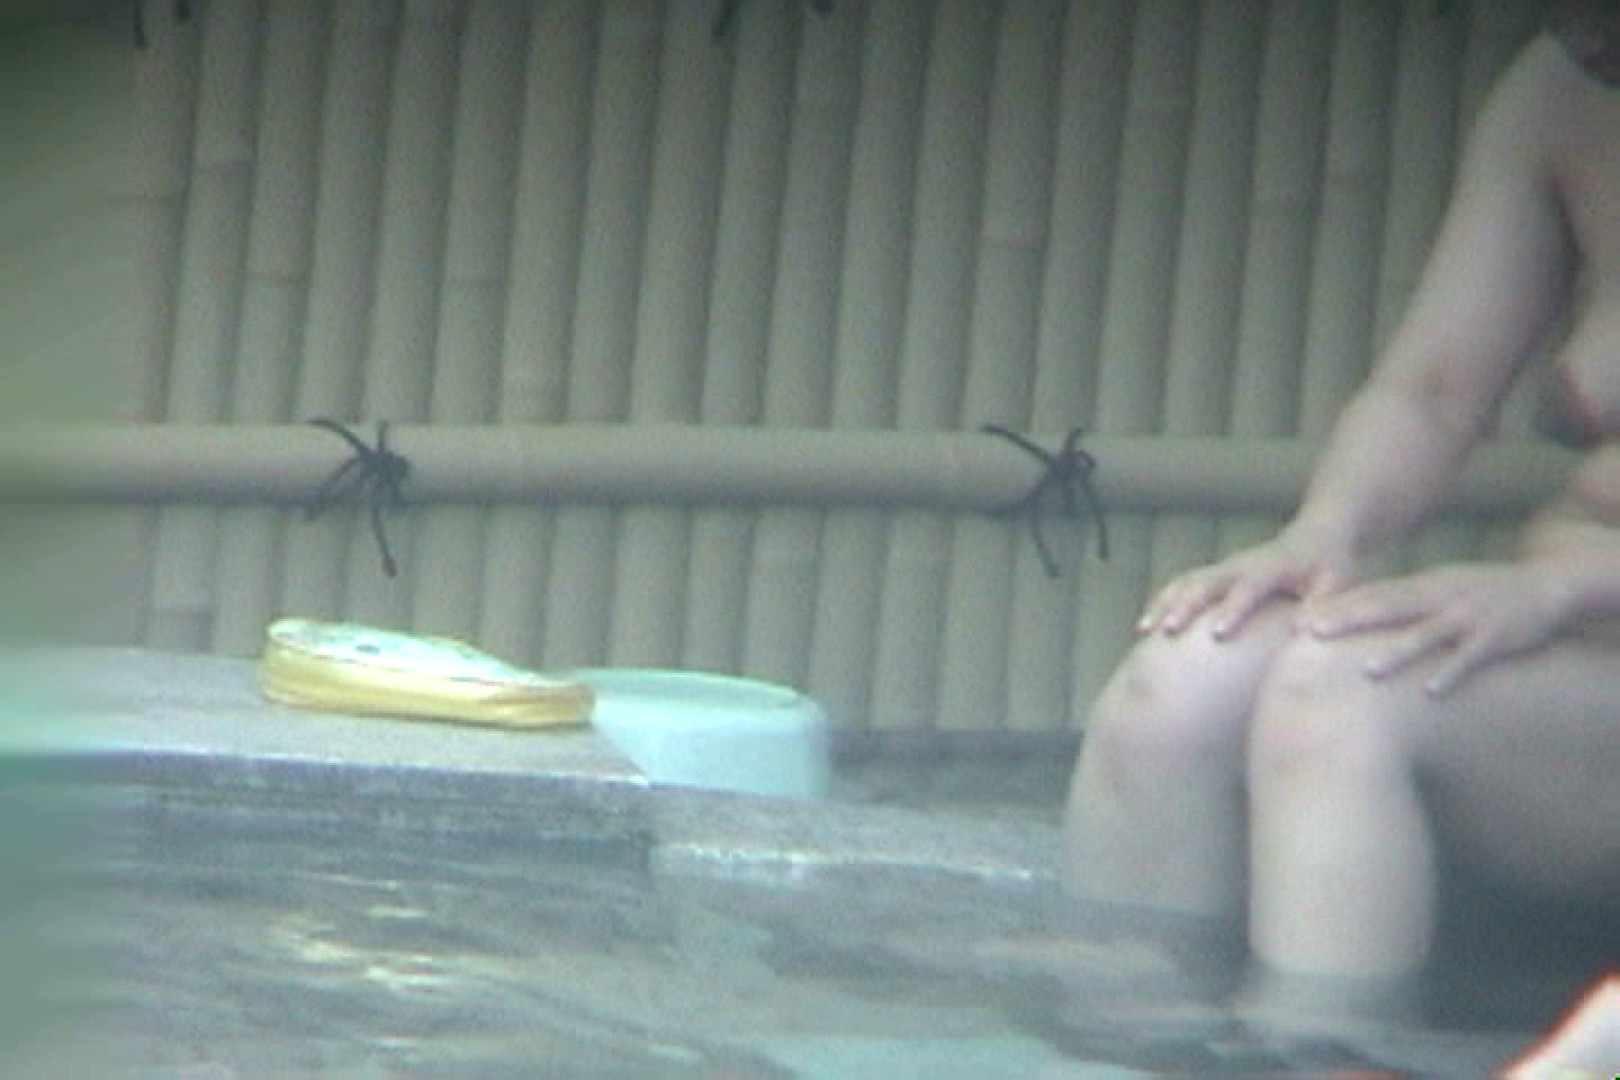 Aquaな露天風呂Vol.107 露天風呂 | OLのエロ生活  51連発 40